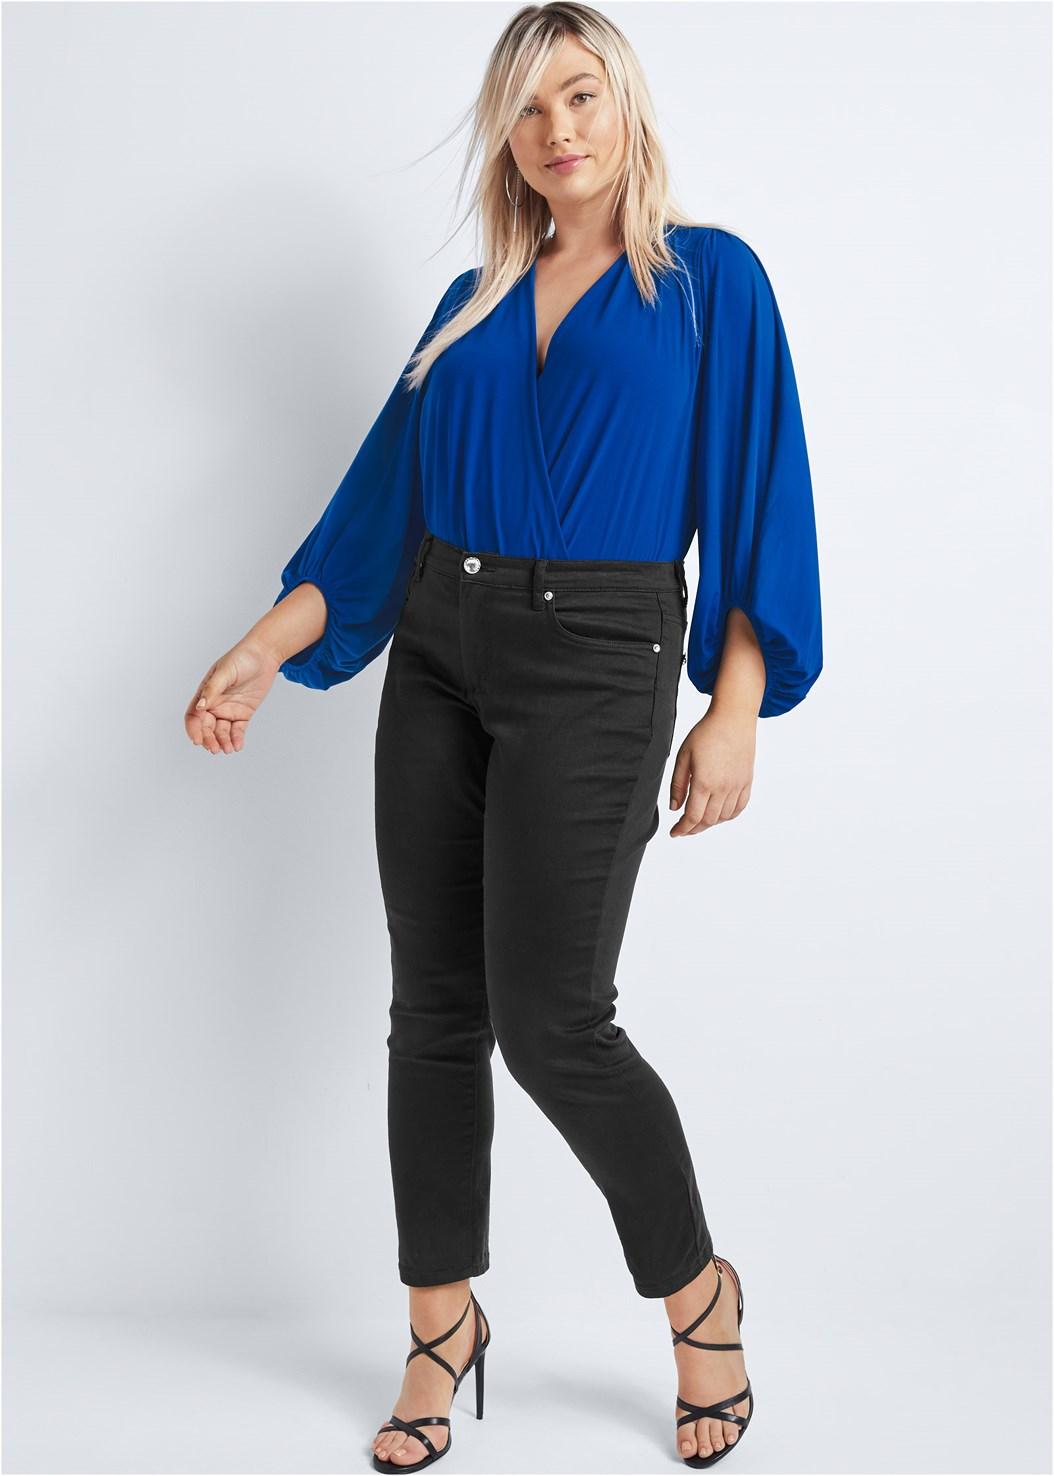 Mid Rise Color Skinny Jeans,Surplice Bodysuit,High Heel Strappy Sandals,Crisscross Strappy Heel,Hoop Detail Earrings